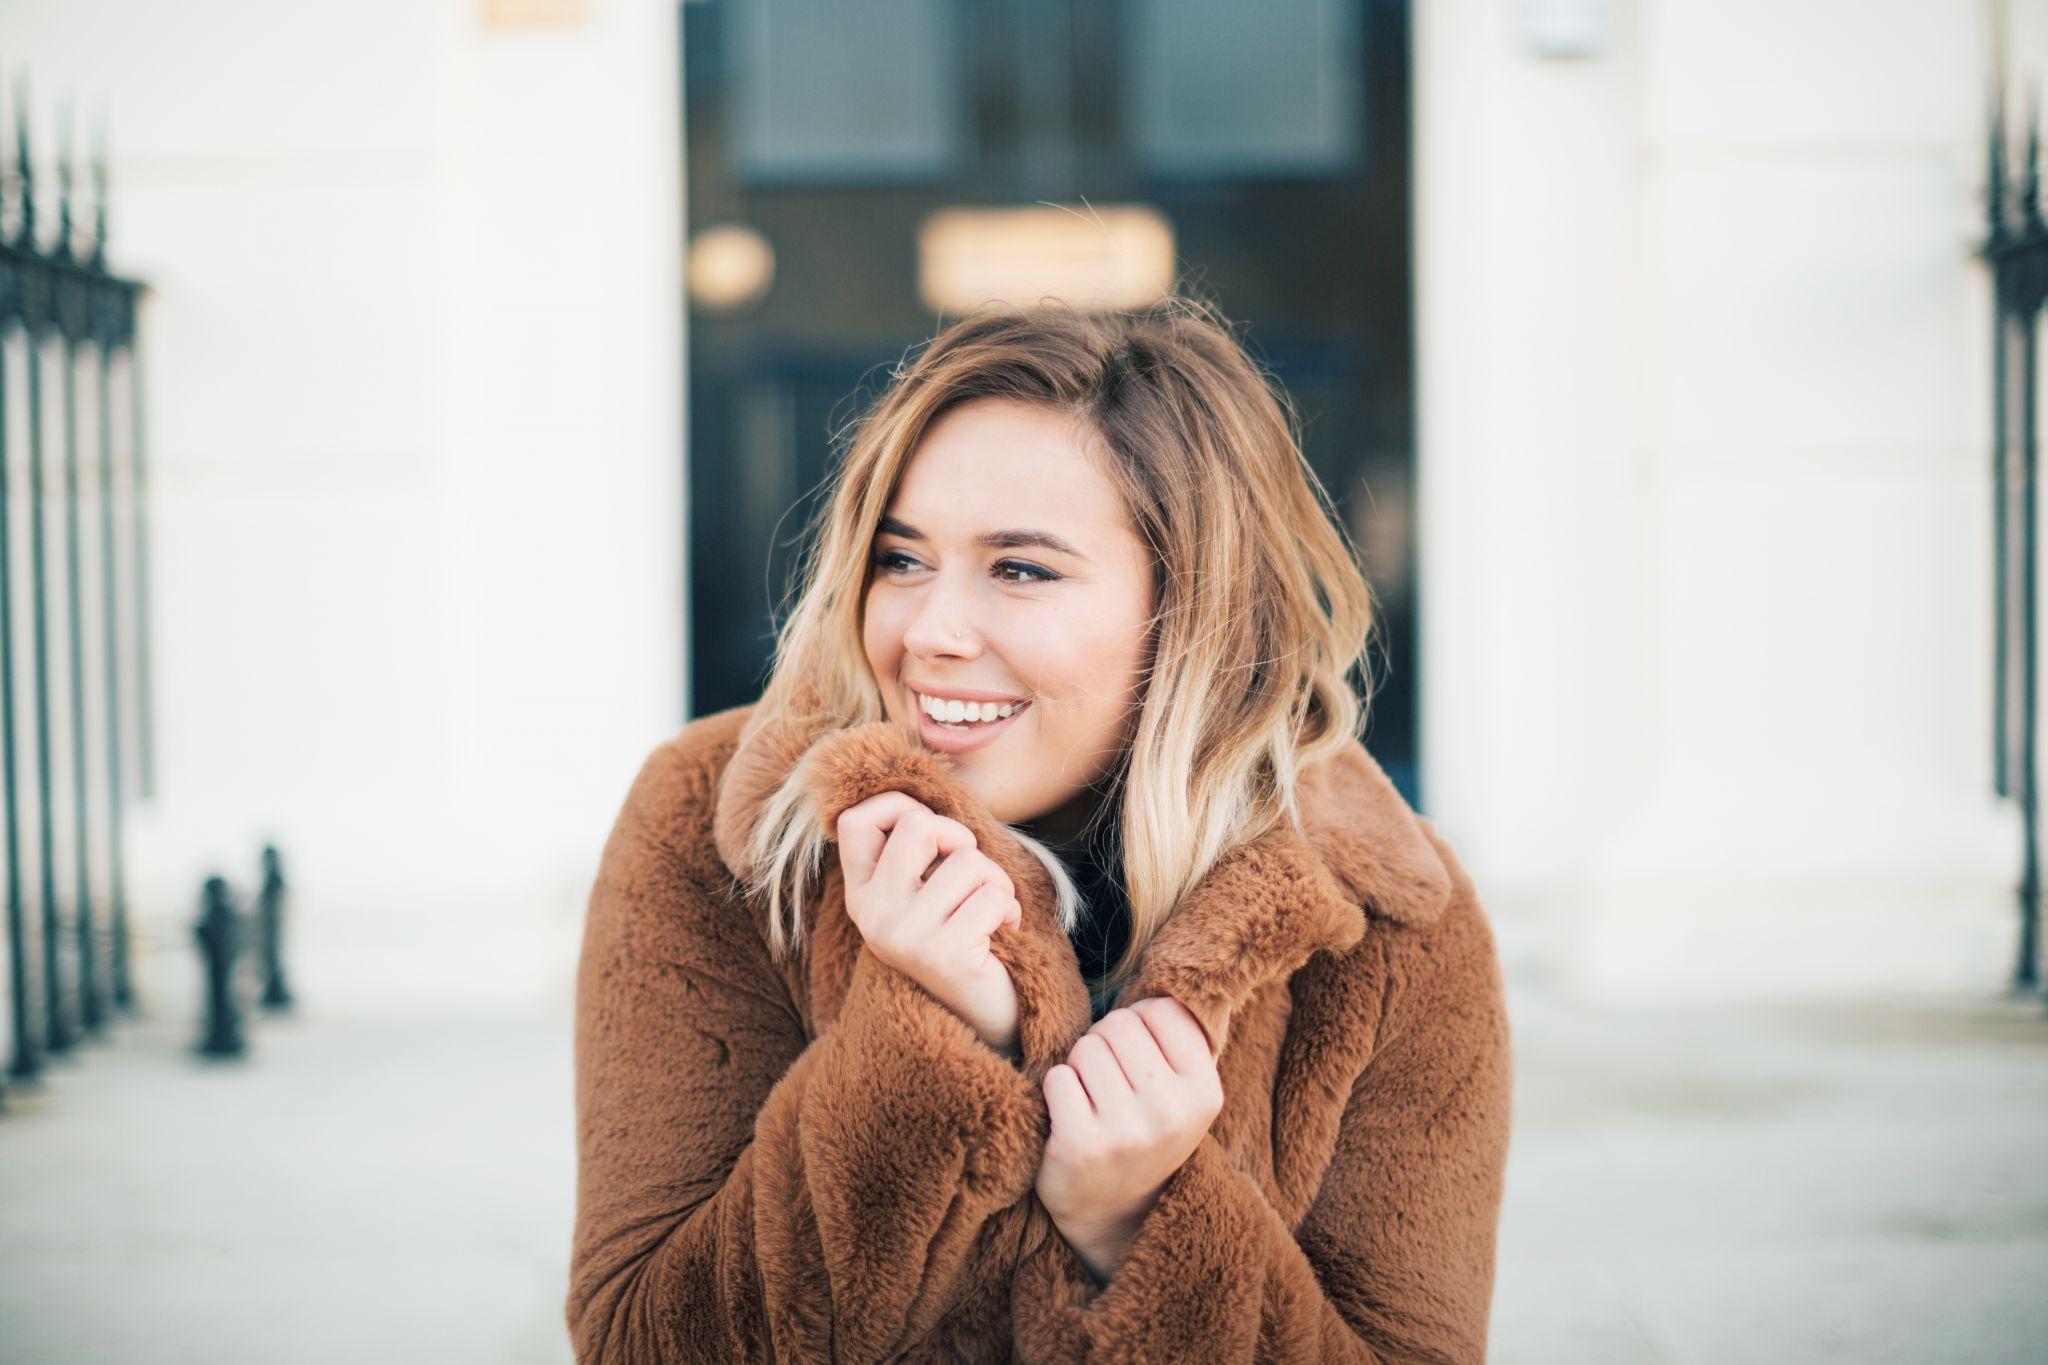 suzie-hello-october-teddy-coat-winter-outfit-chanel-bag-december-2017-25